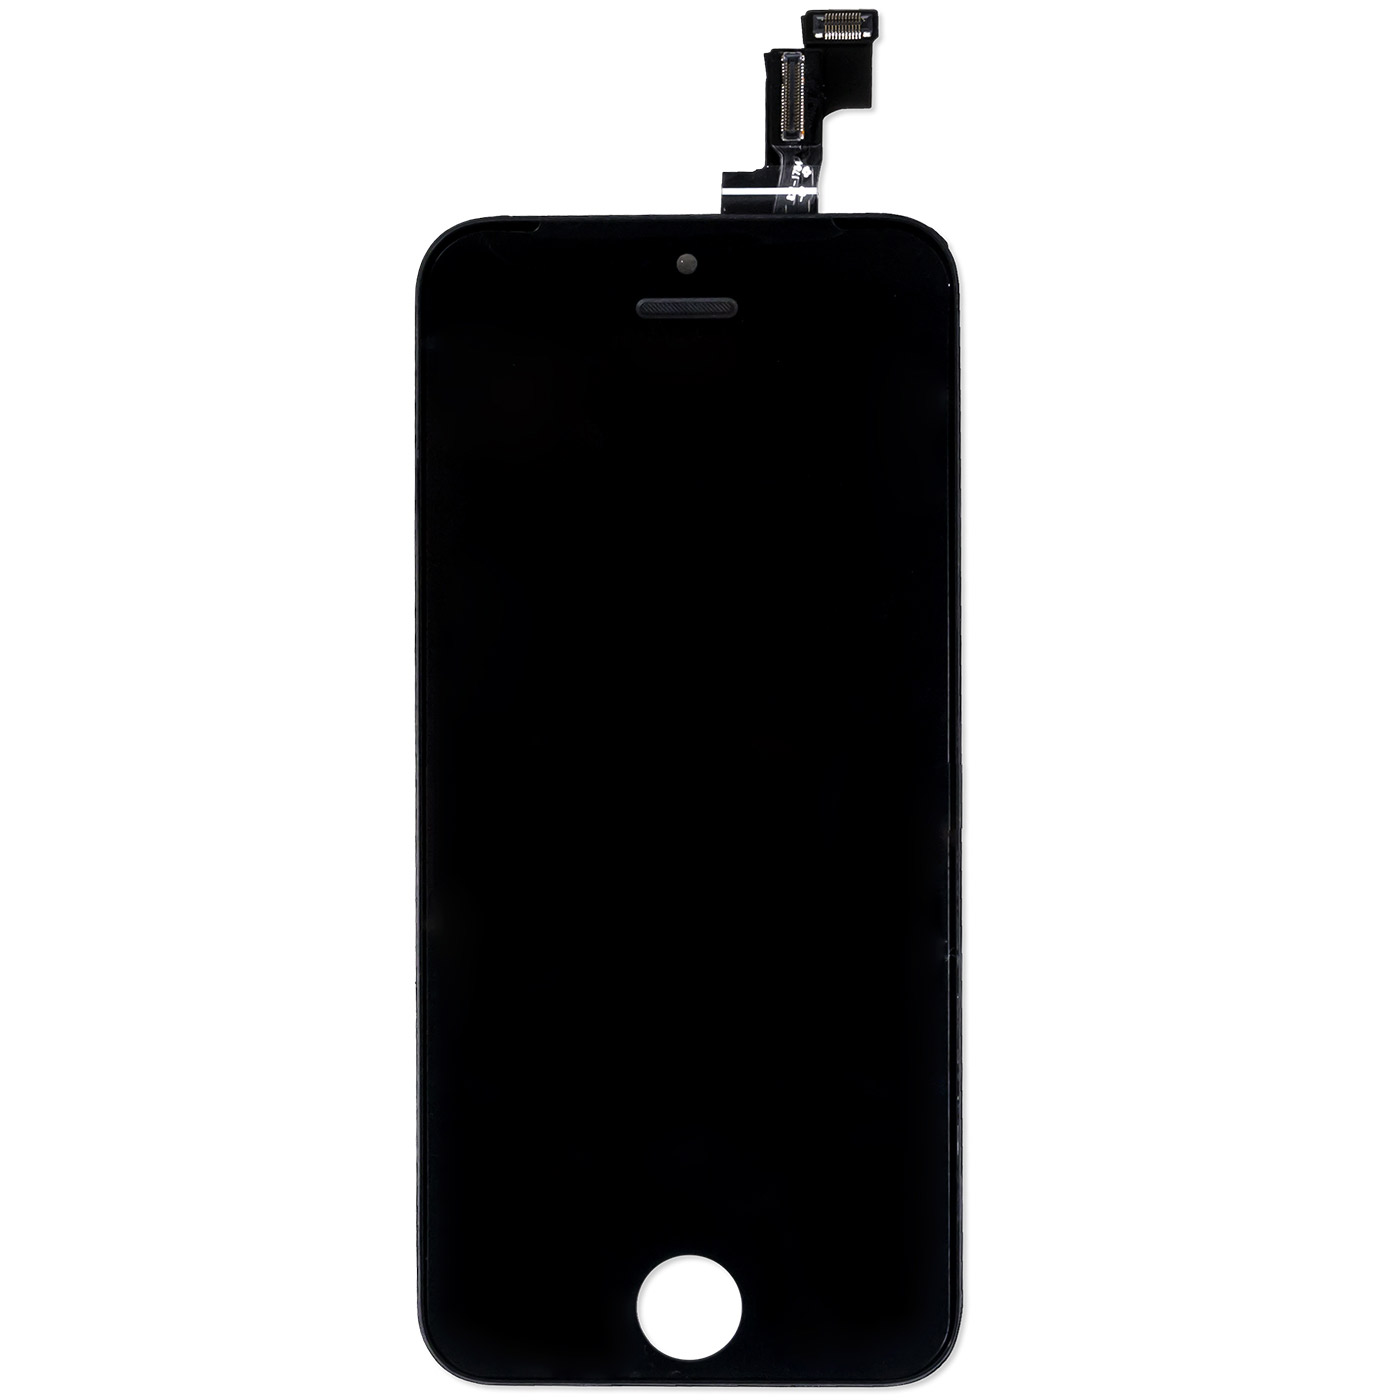 remade kit de r paration cran iphone 5s noir. Black Bedroom Furniture Sets. Home Design Ideas